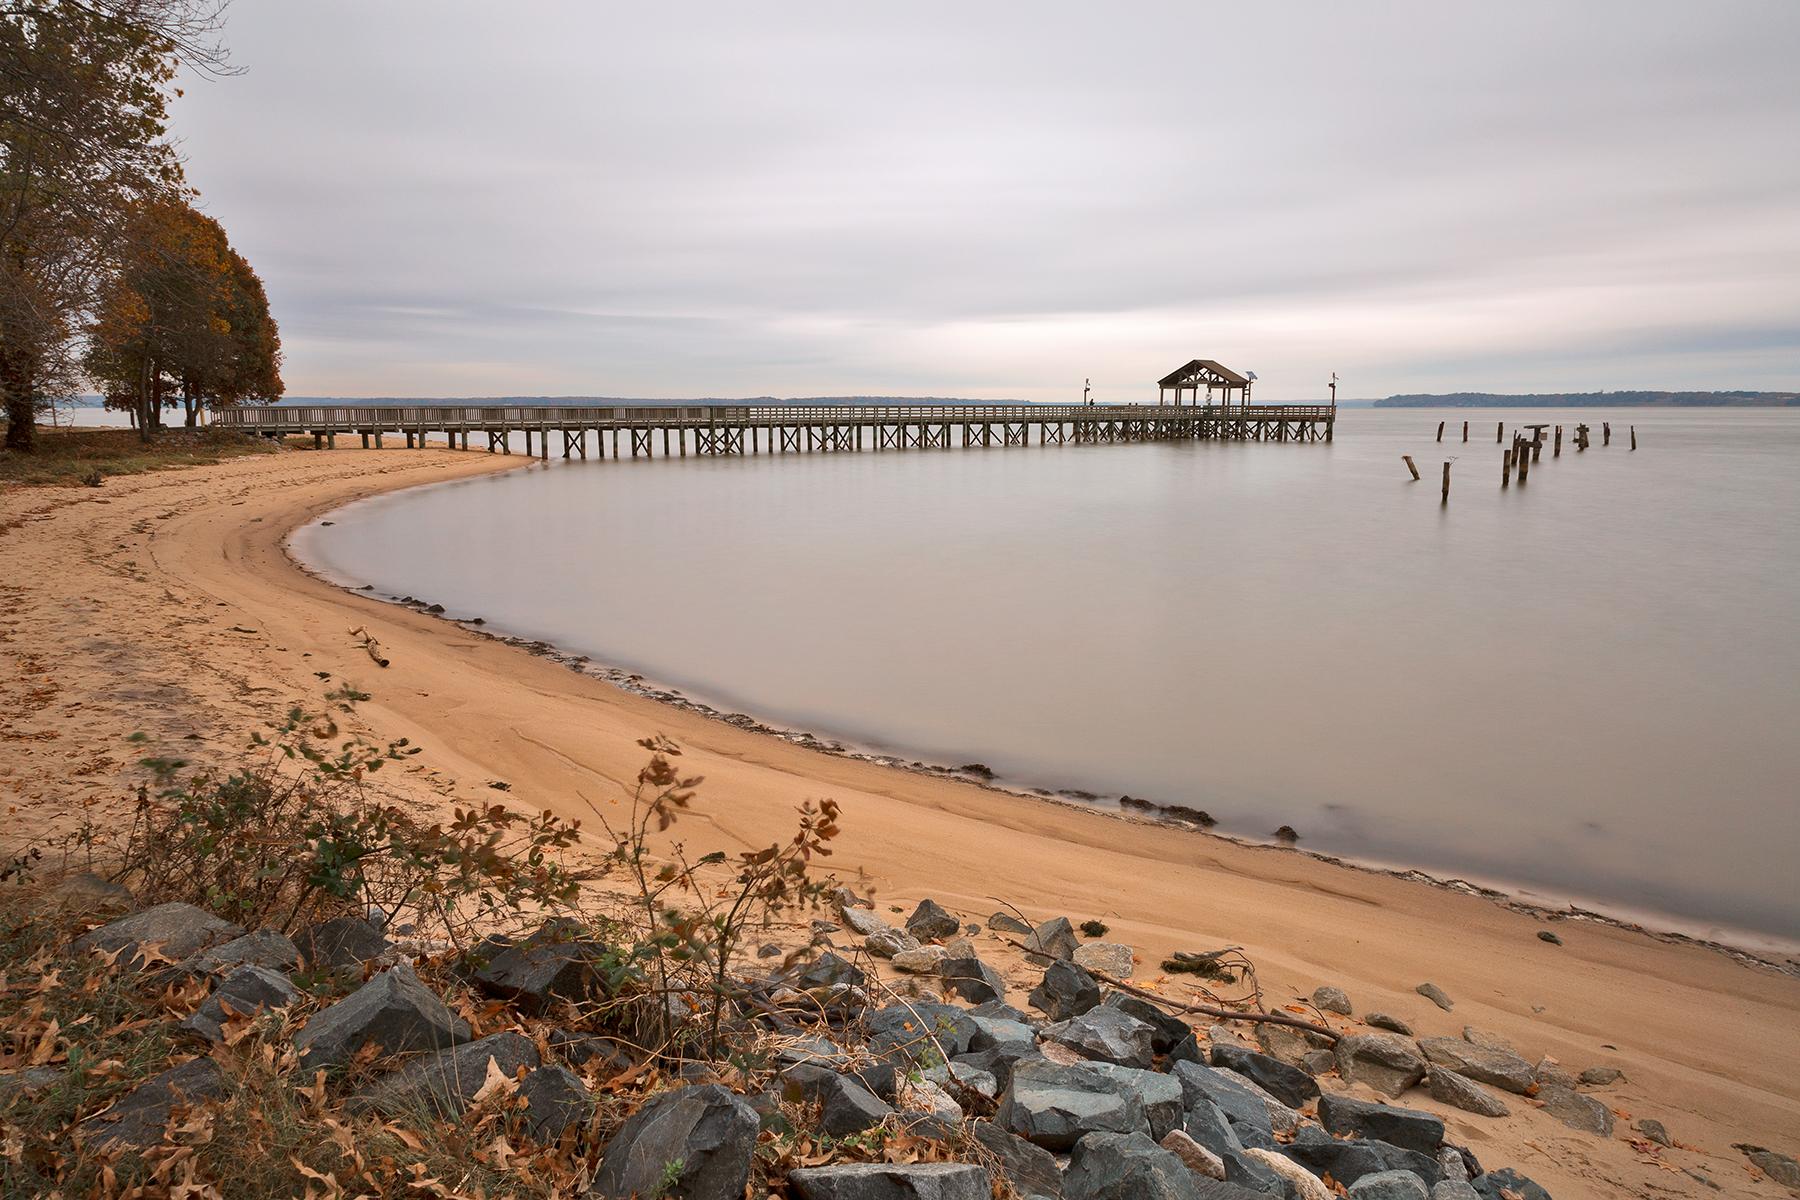 Leesylvania Beach Pier, , Pylon, Shade, Sea, HQ Photo